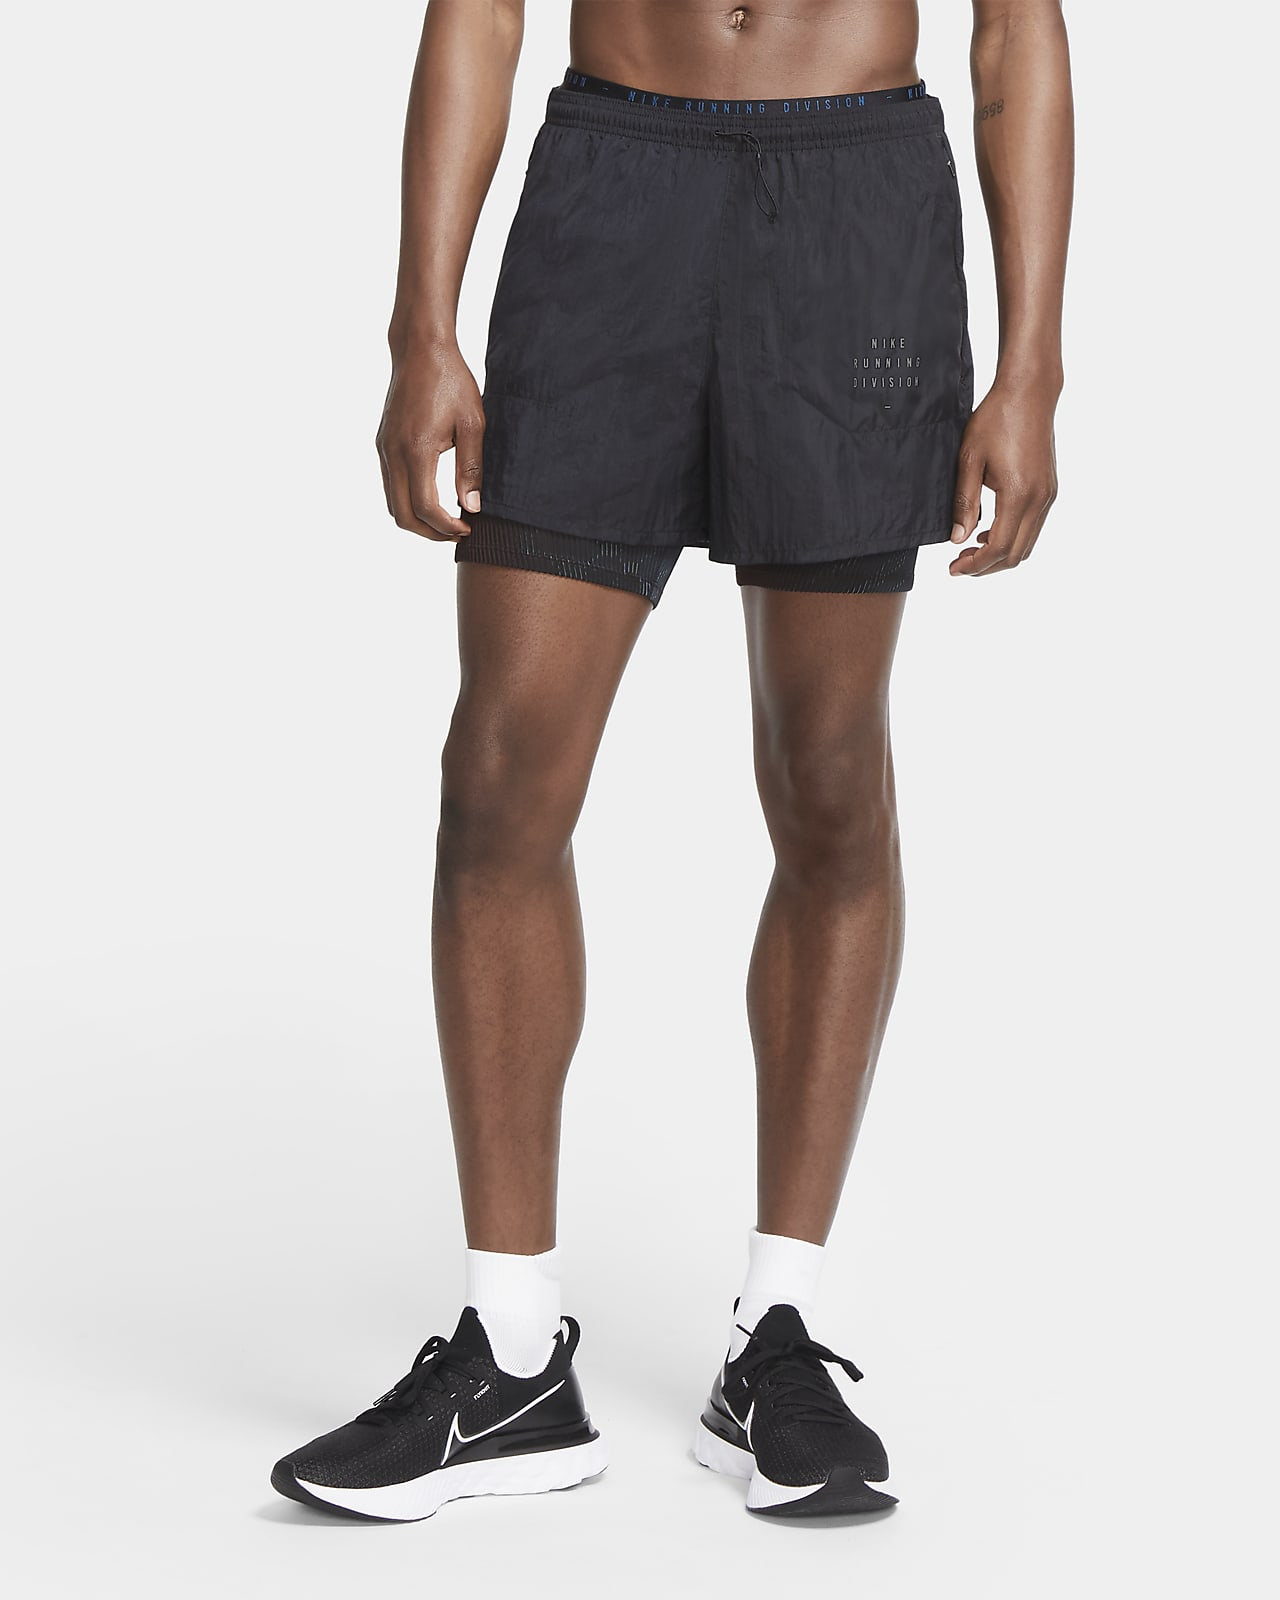 Nike Run Division Pantalons curts 3 en 1 de running - Home